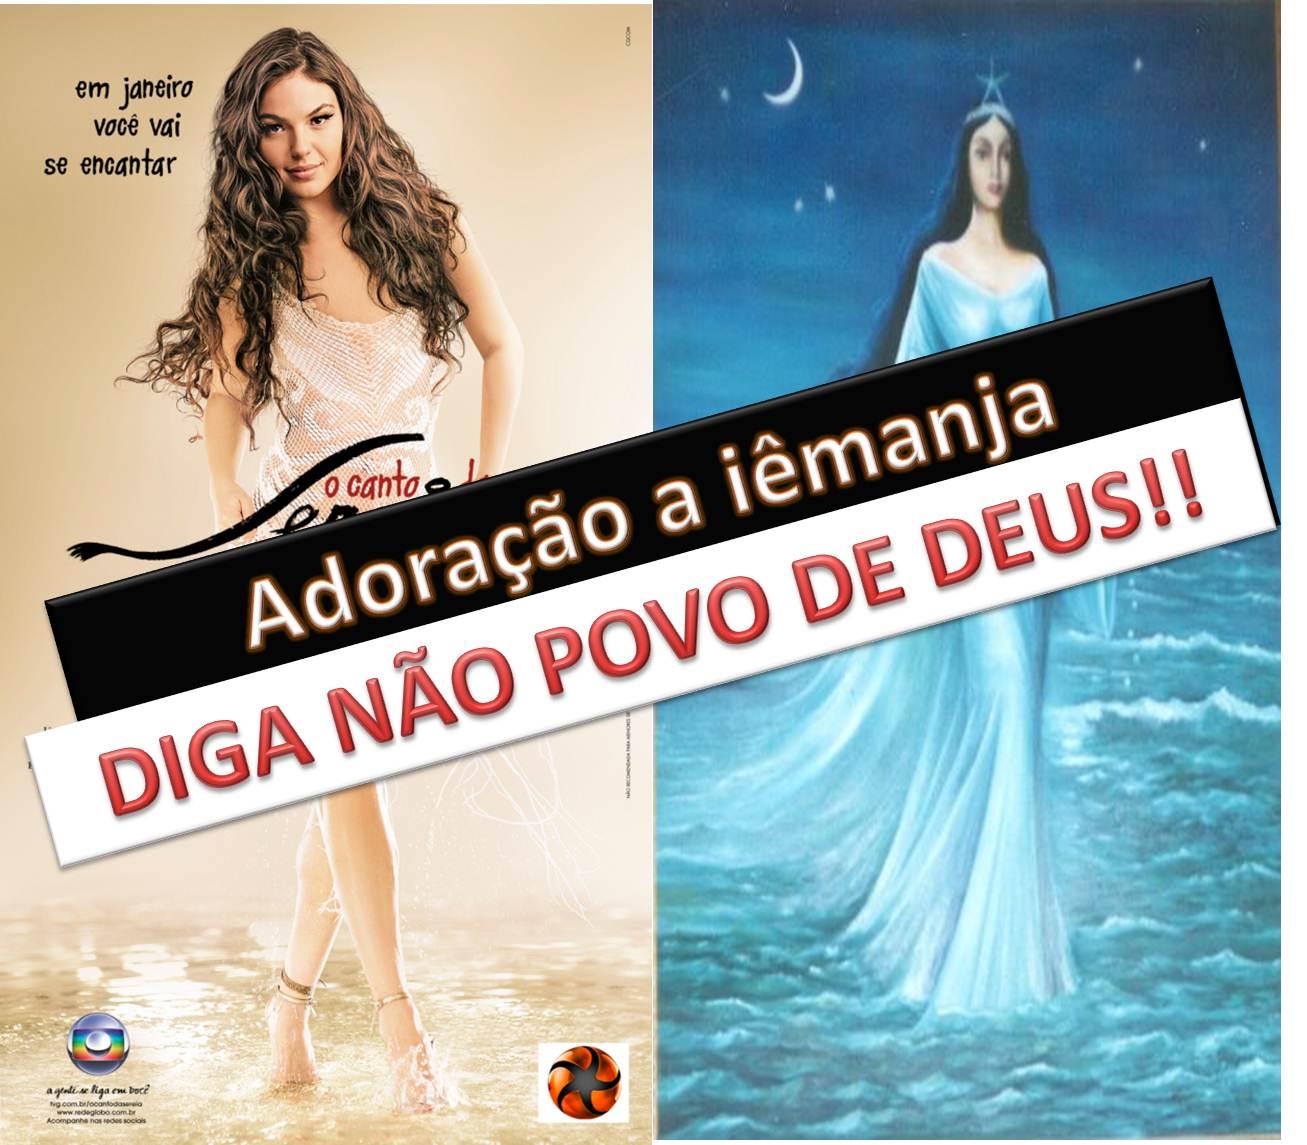 Big brother brasil porn orgy - 4 1